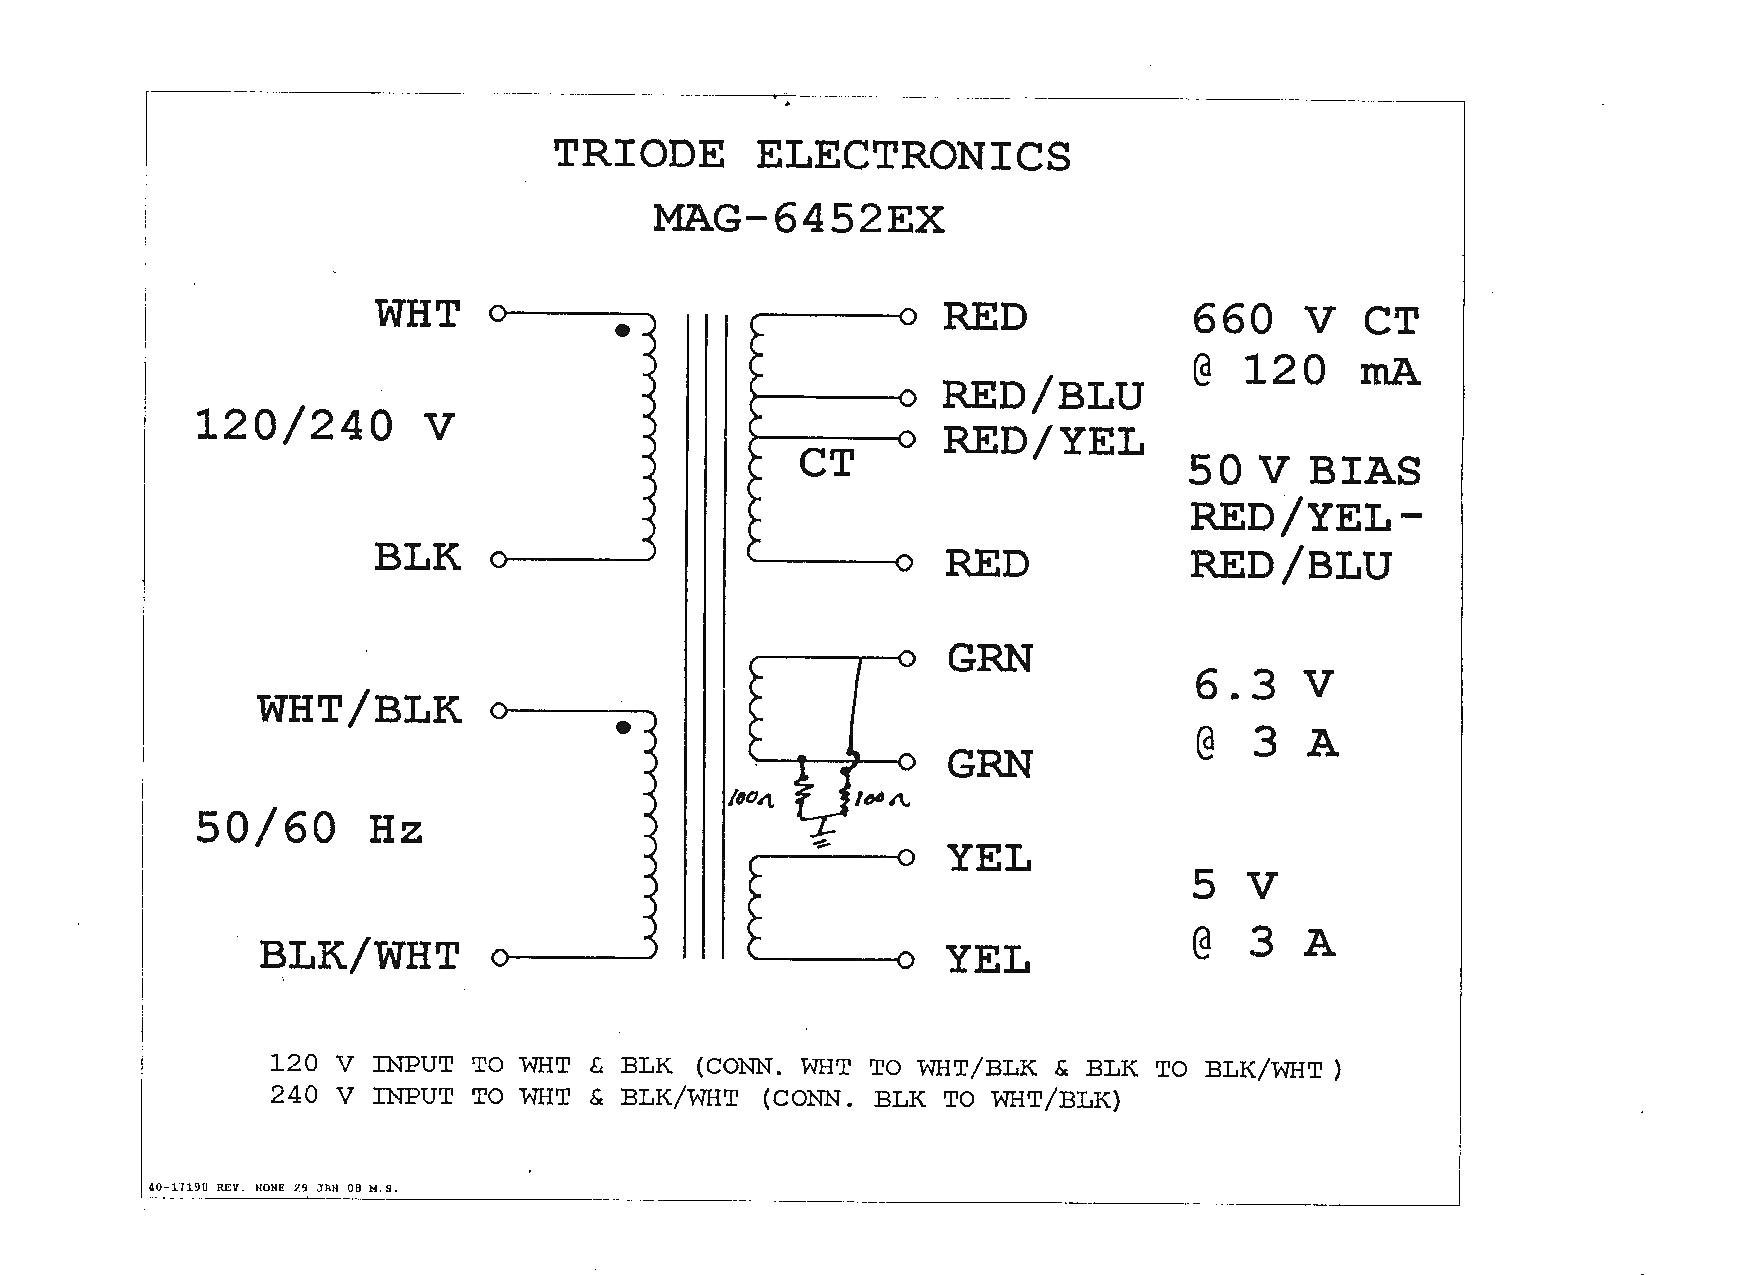 control transformer wiring diagram Download-Hvac Transformer Wiring Diagram Inspirationa Wiring Diagram Auto Transformer Starter Save Acme Transformers 3-n